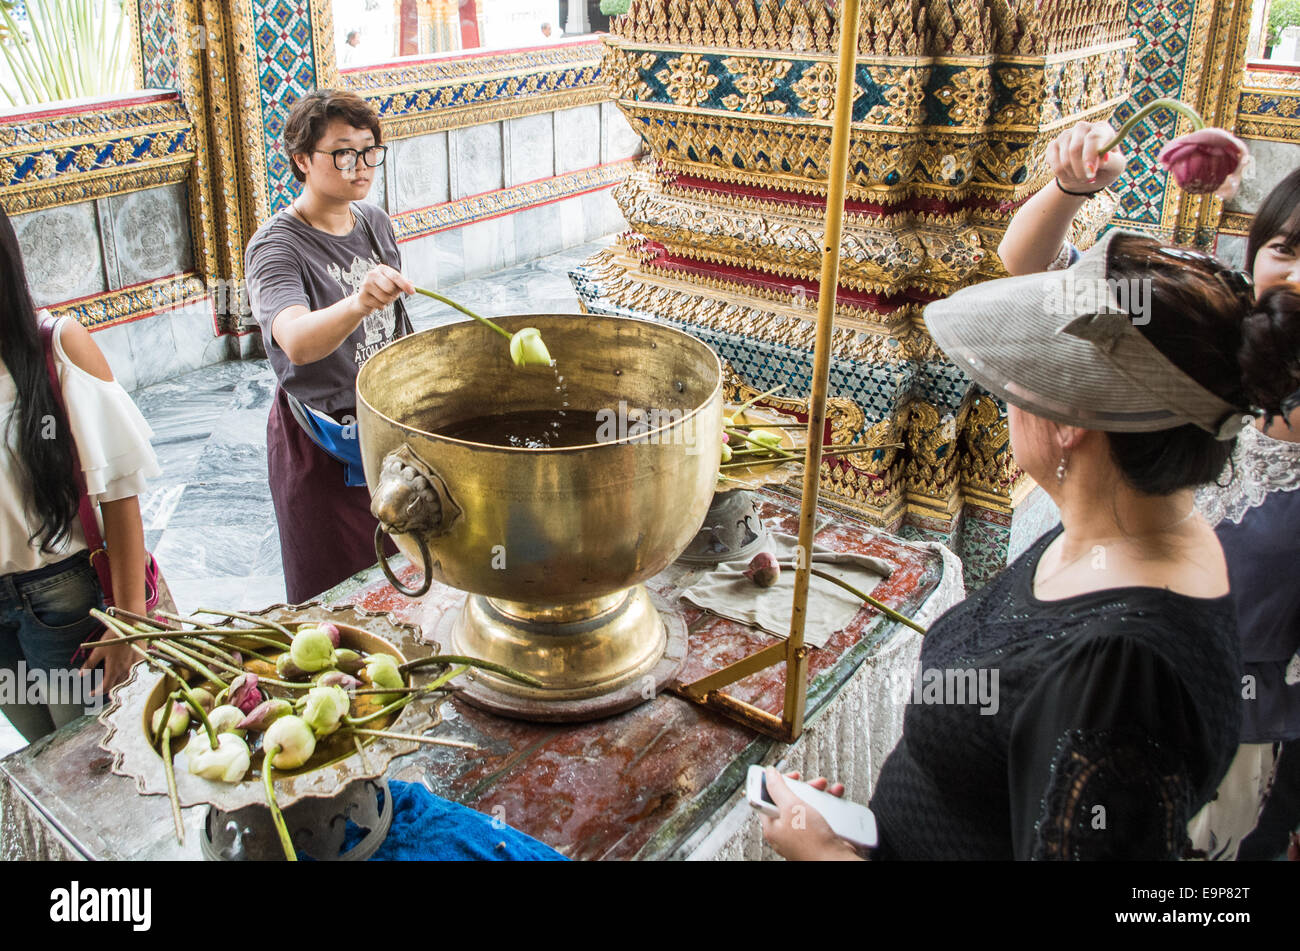 People is doing rituals in Wat Phra Kaew of bangkok grand palace - Stock Image